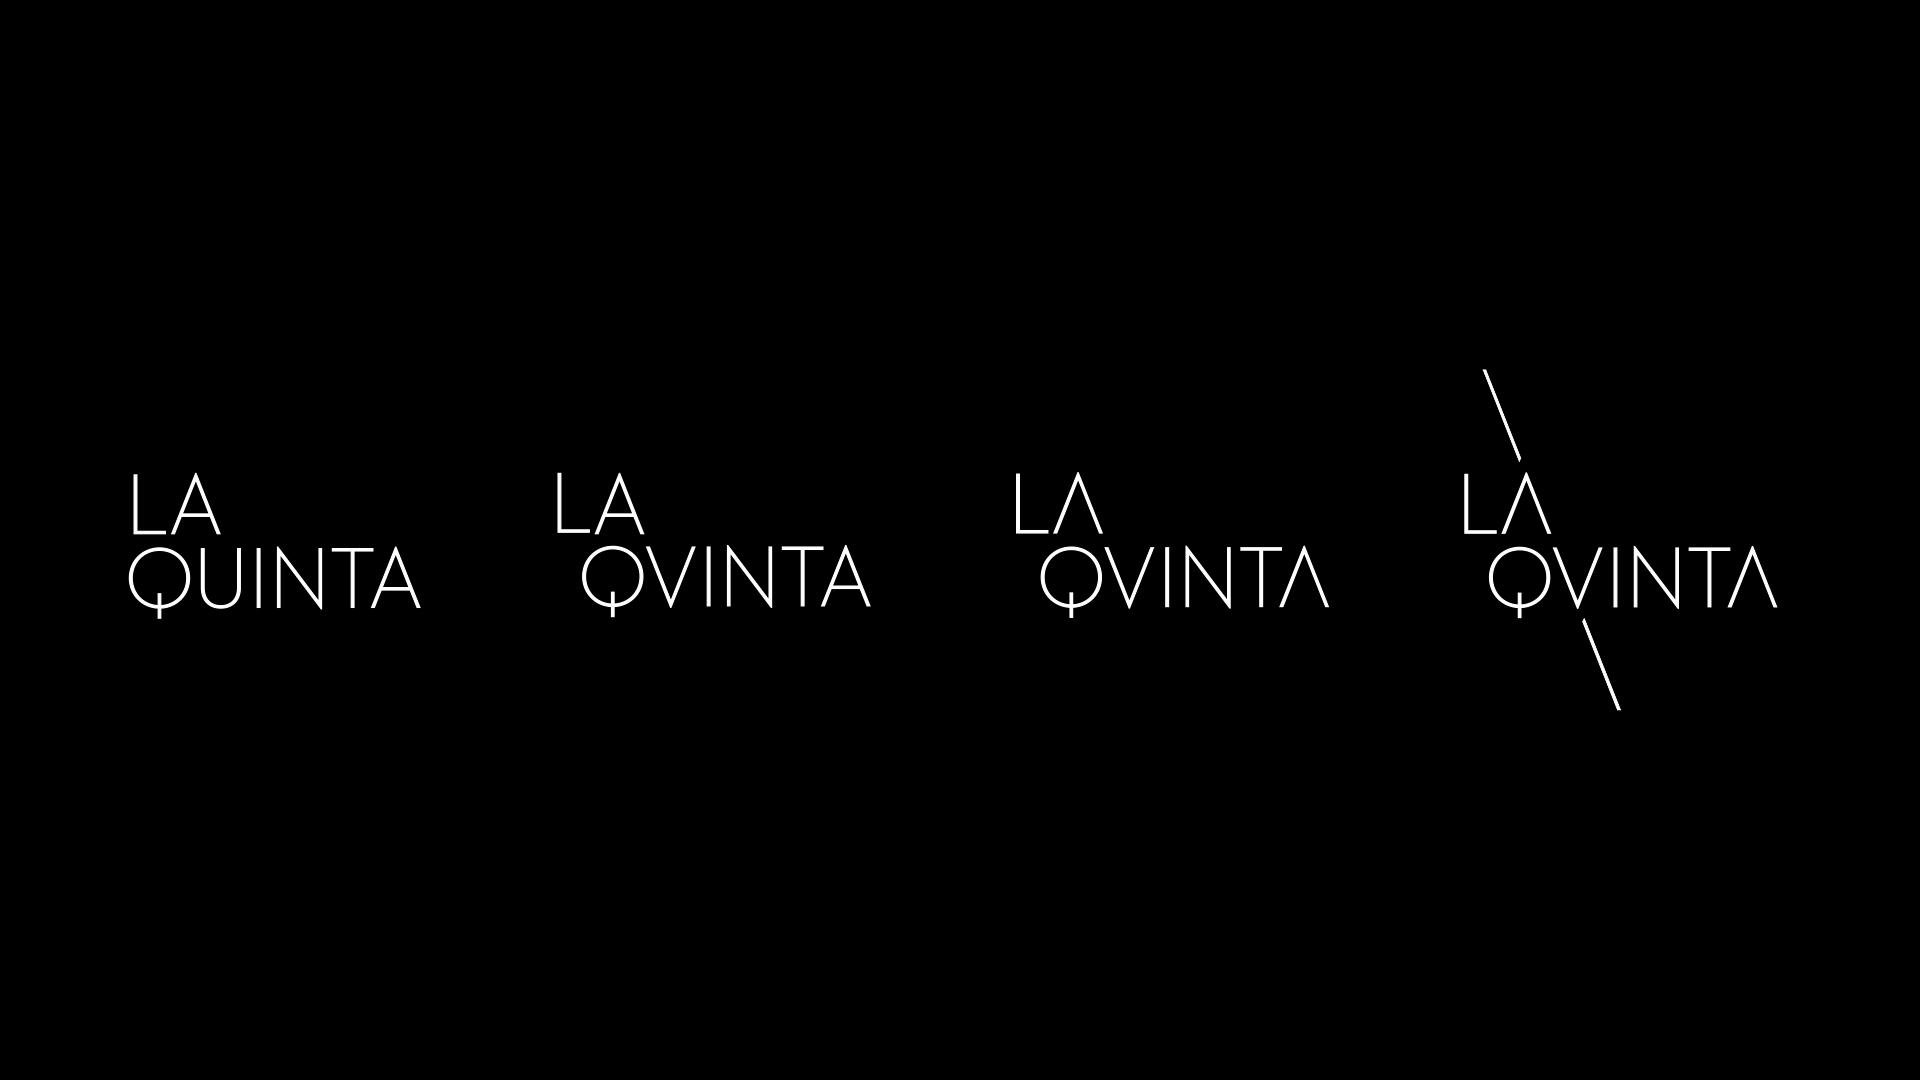 LA QVINTA 04.jpeg